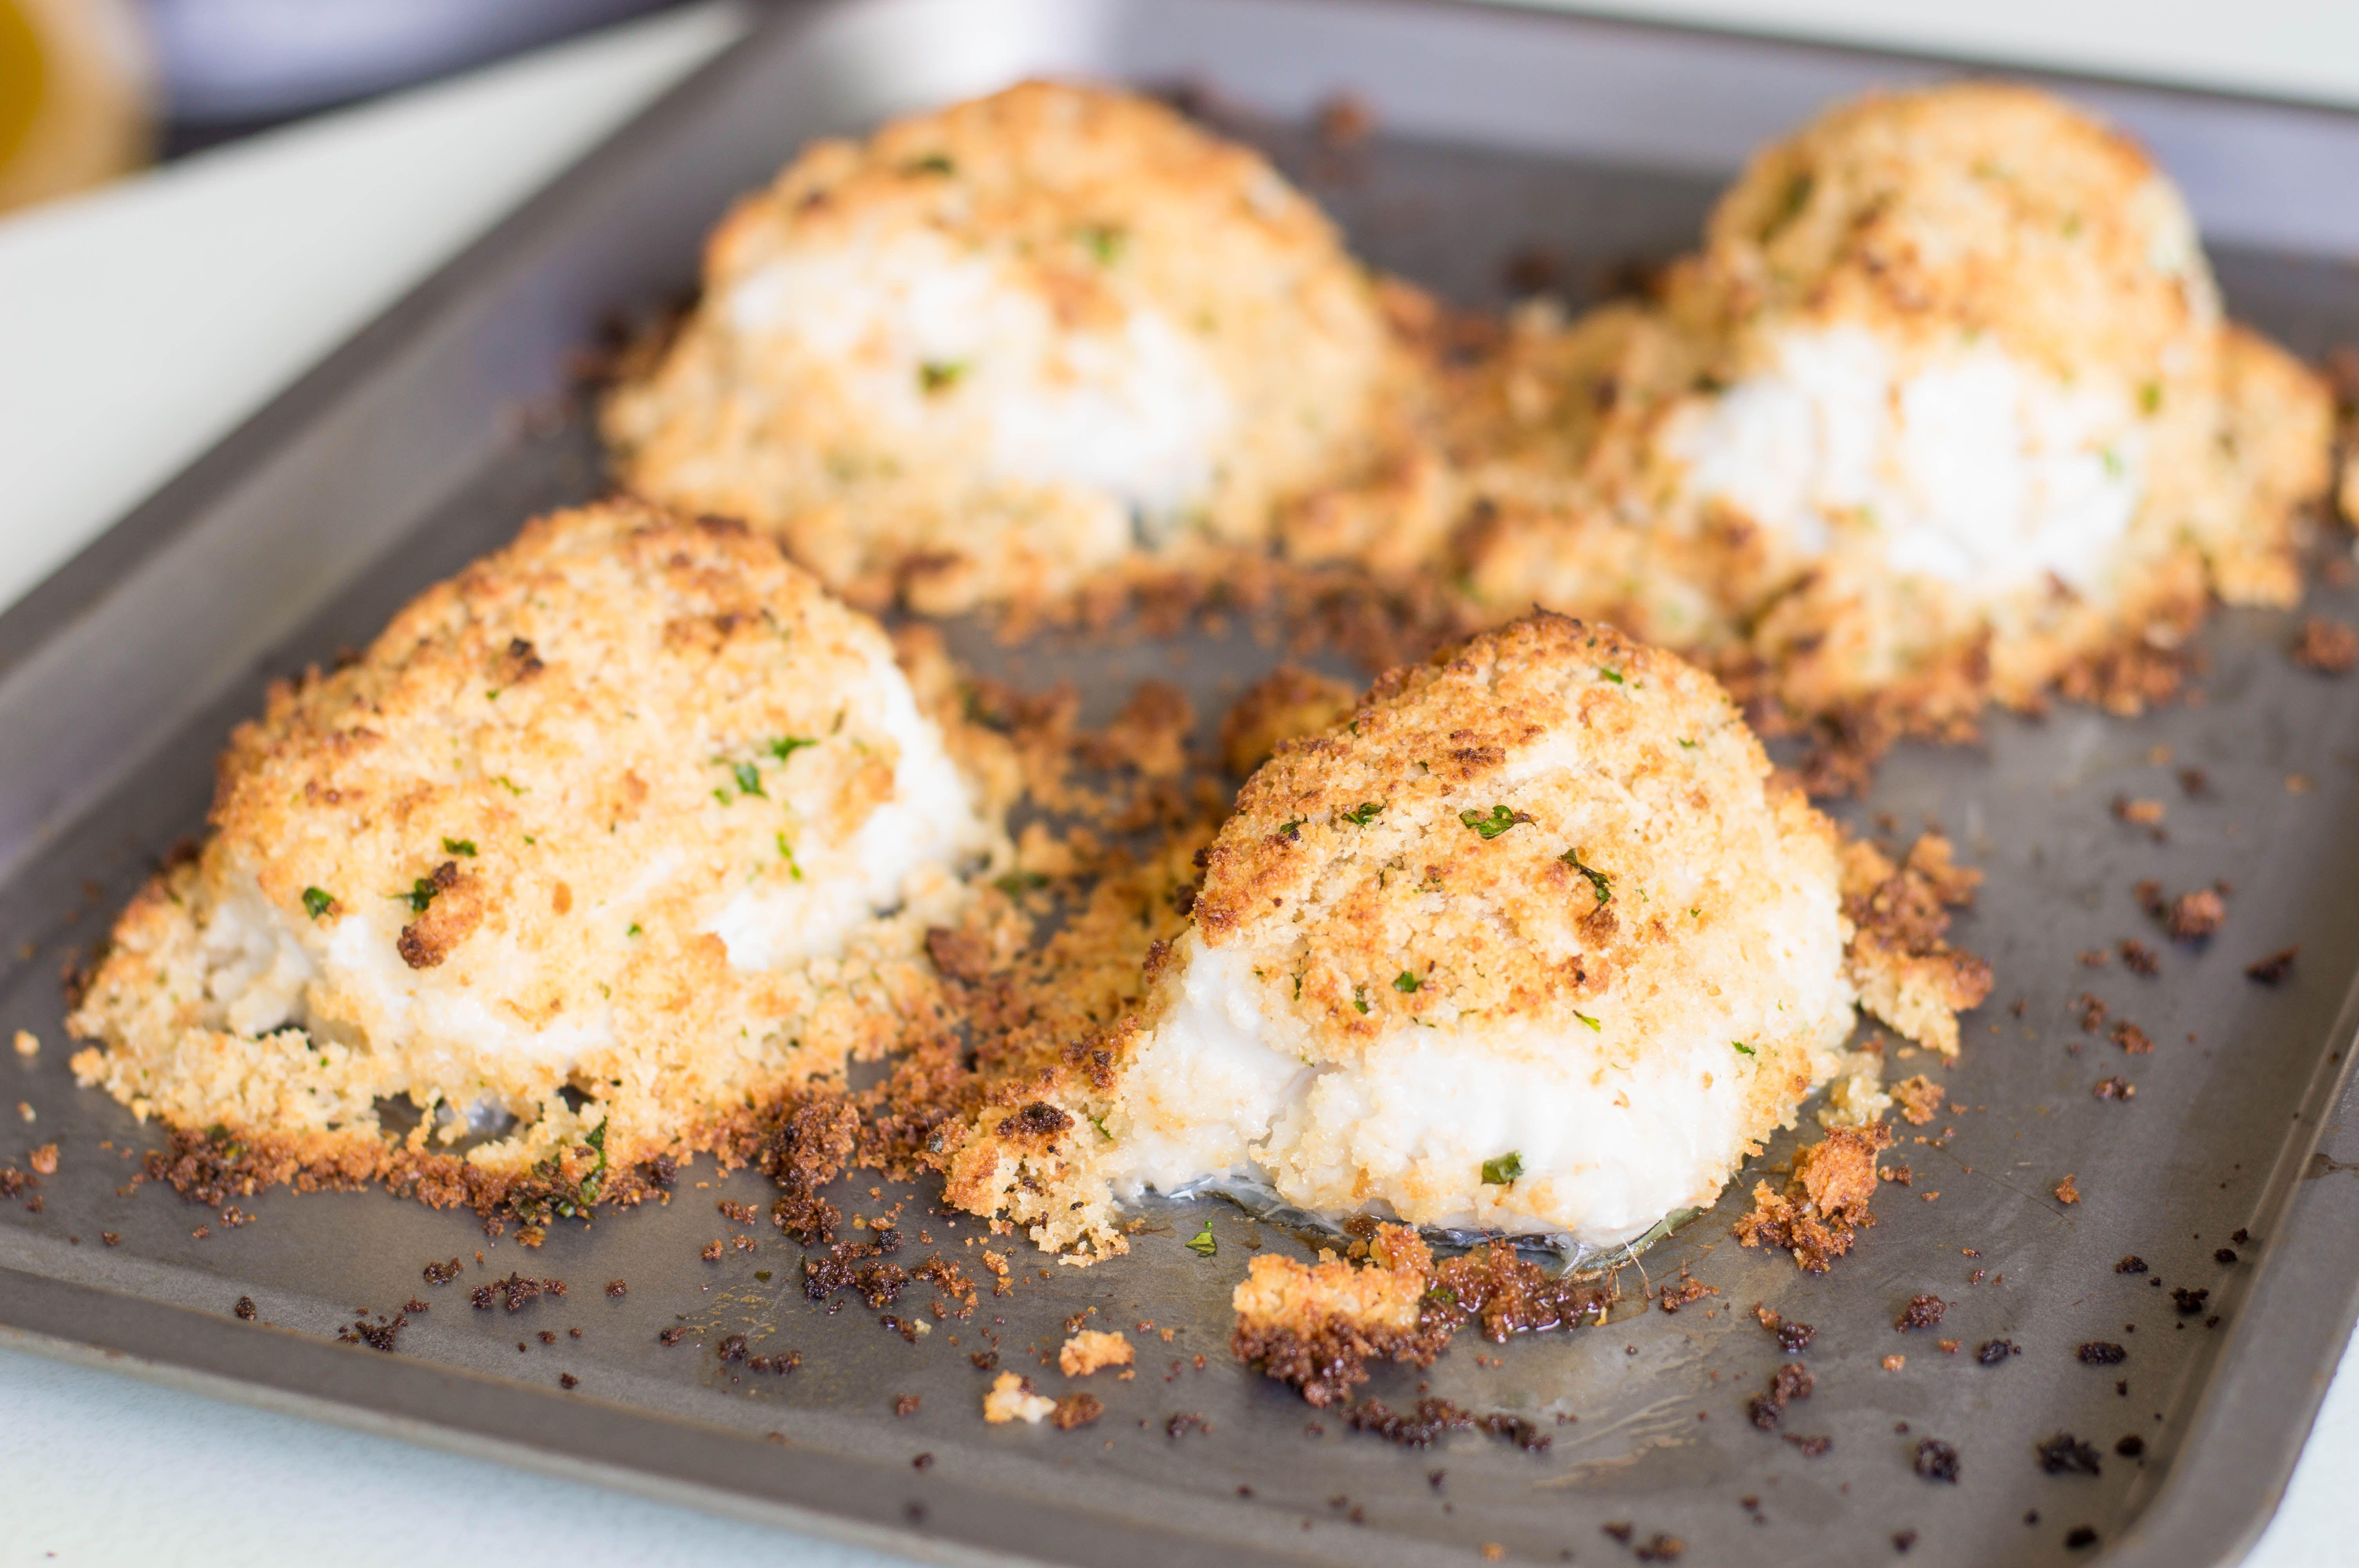 Parmesan-crusted halibut on rimmed baking sheets